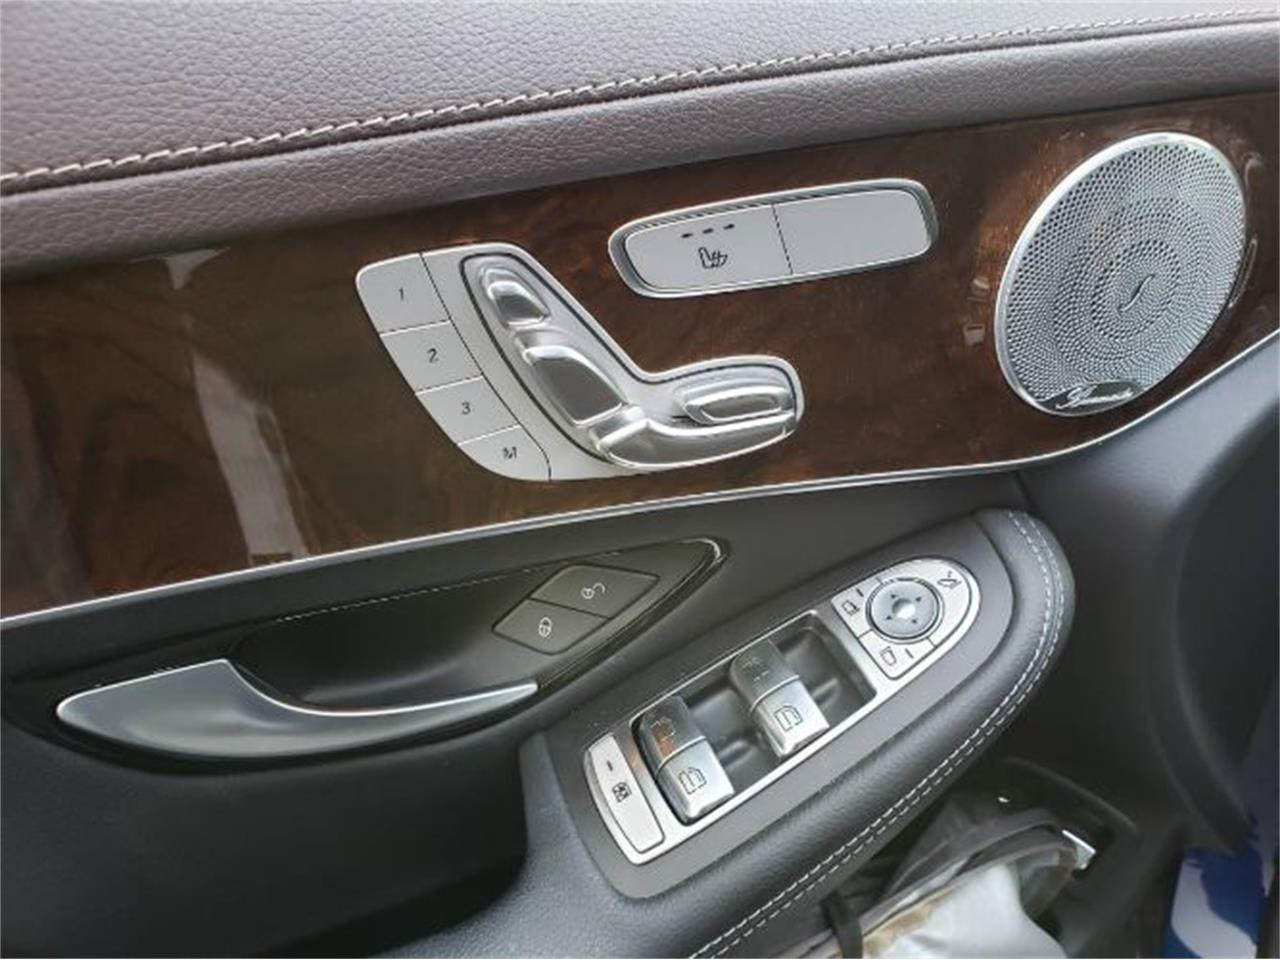 2018 Mercedes-Benz GLC-Class (CC-1390020) for sale in Cadillac, Michigan